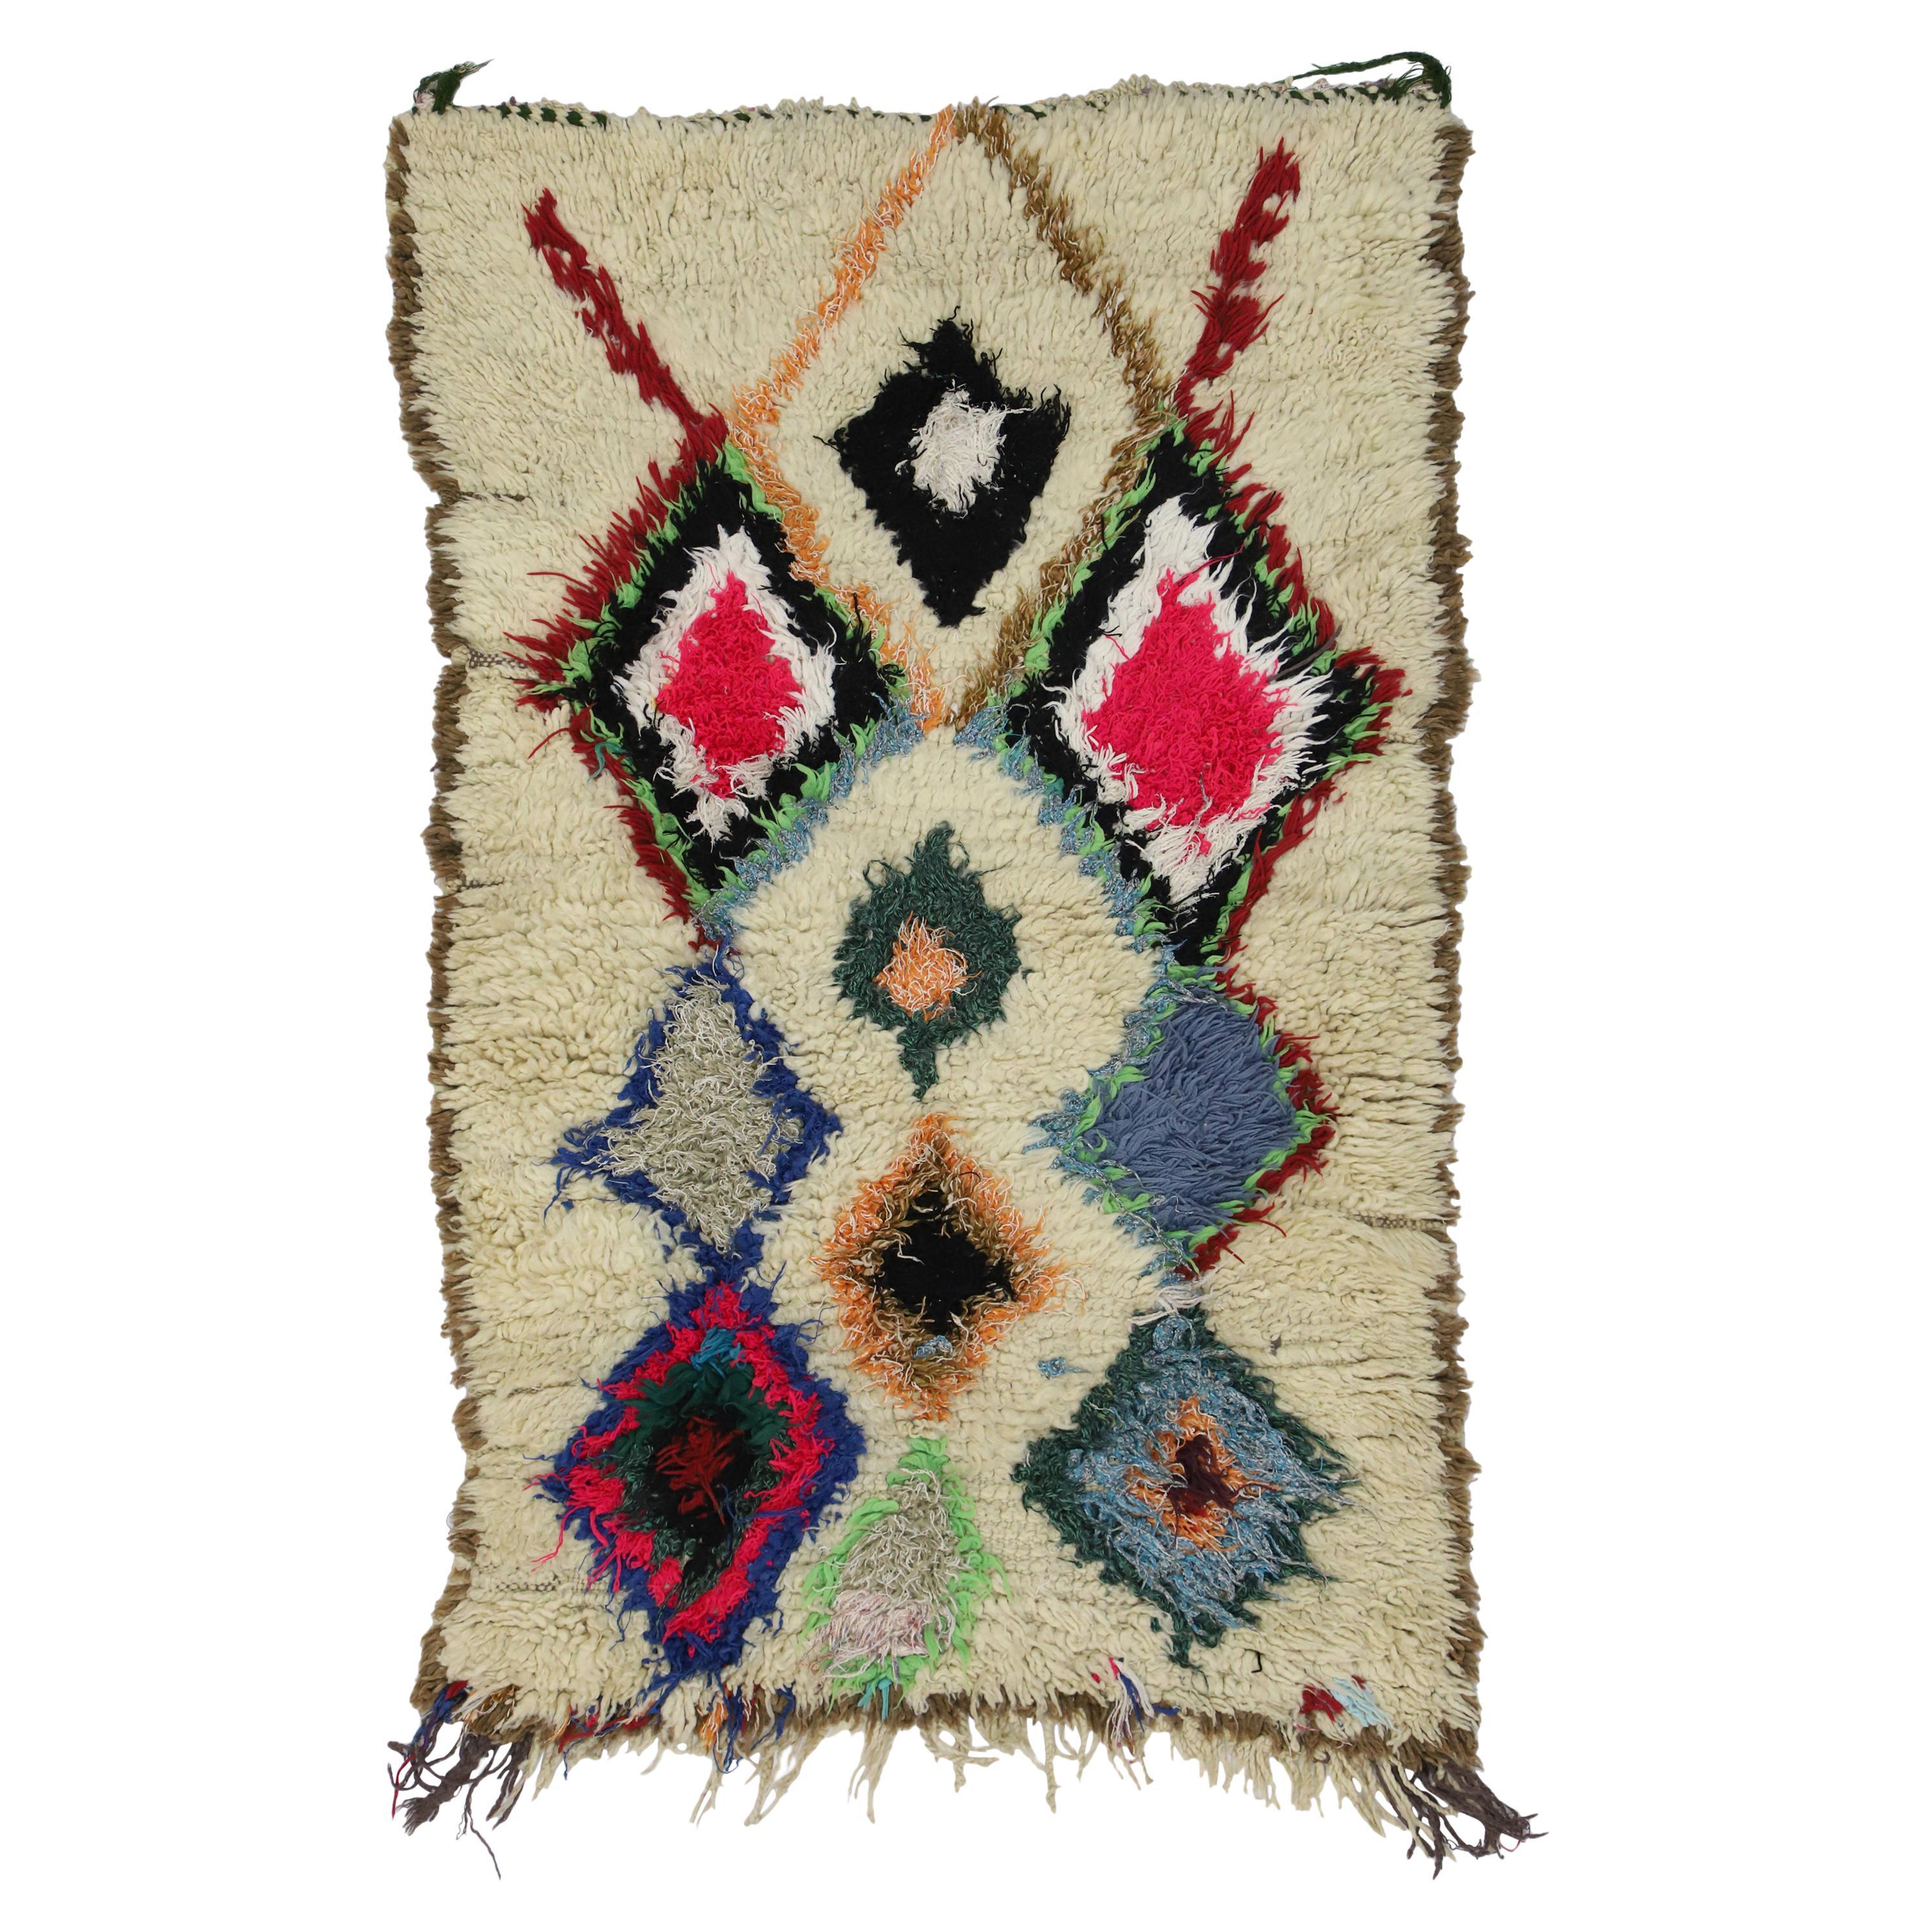 Vintage Moroccan Azilal Rug with Bohemian Style, Moroccan Boucherouite Rug